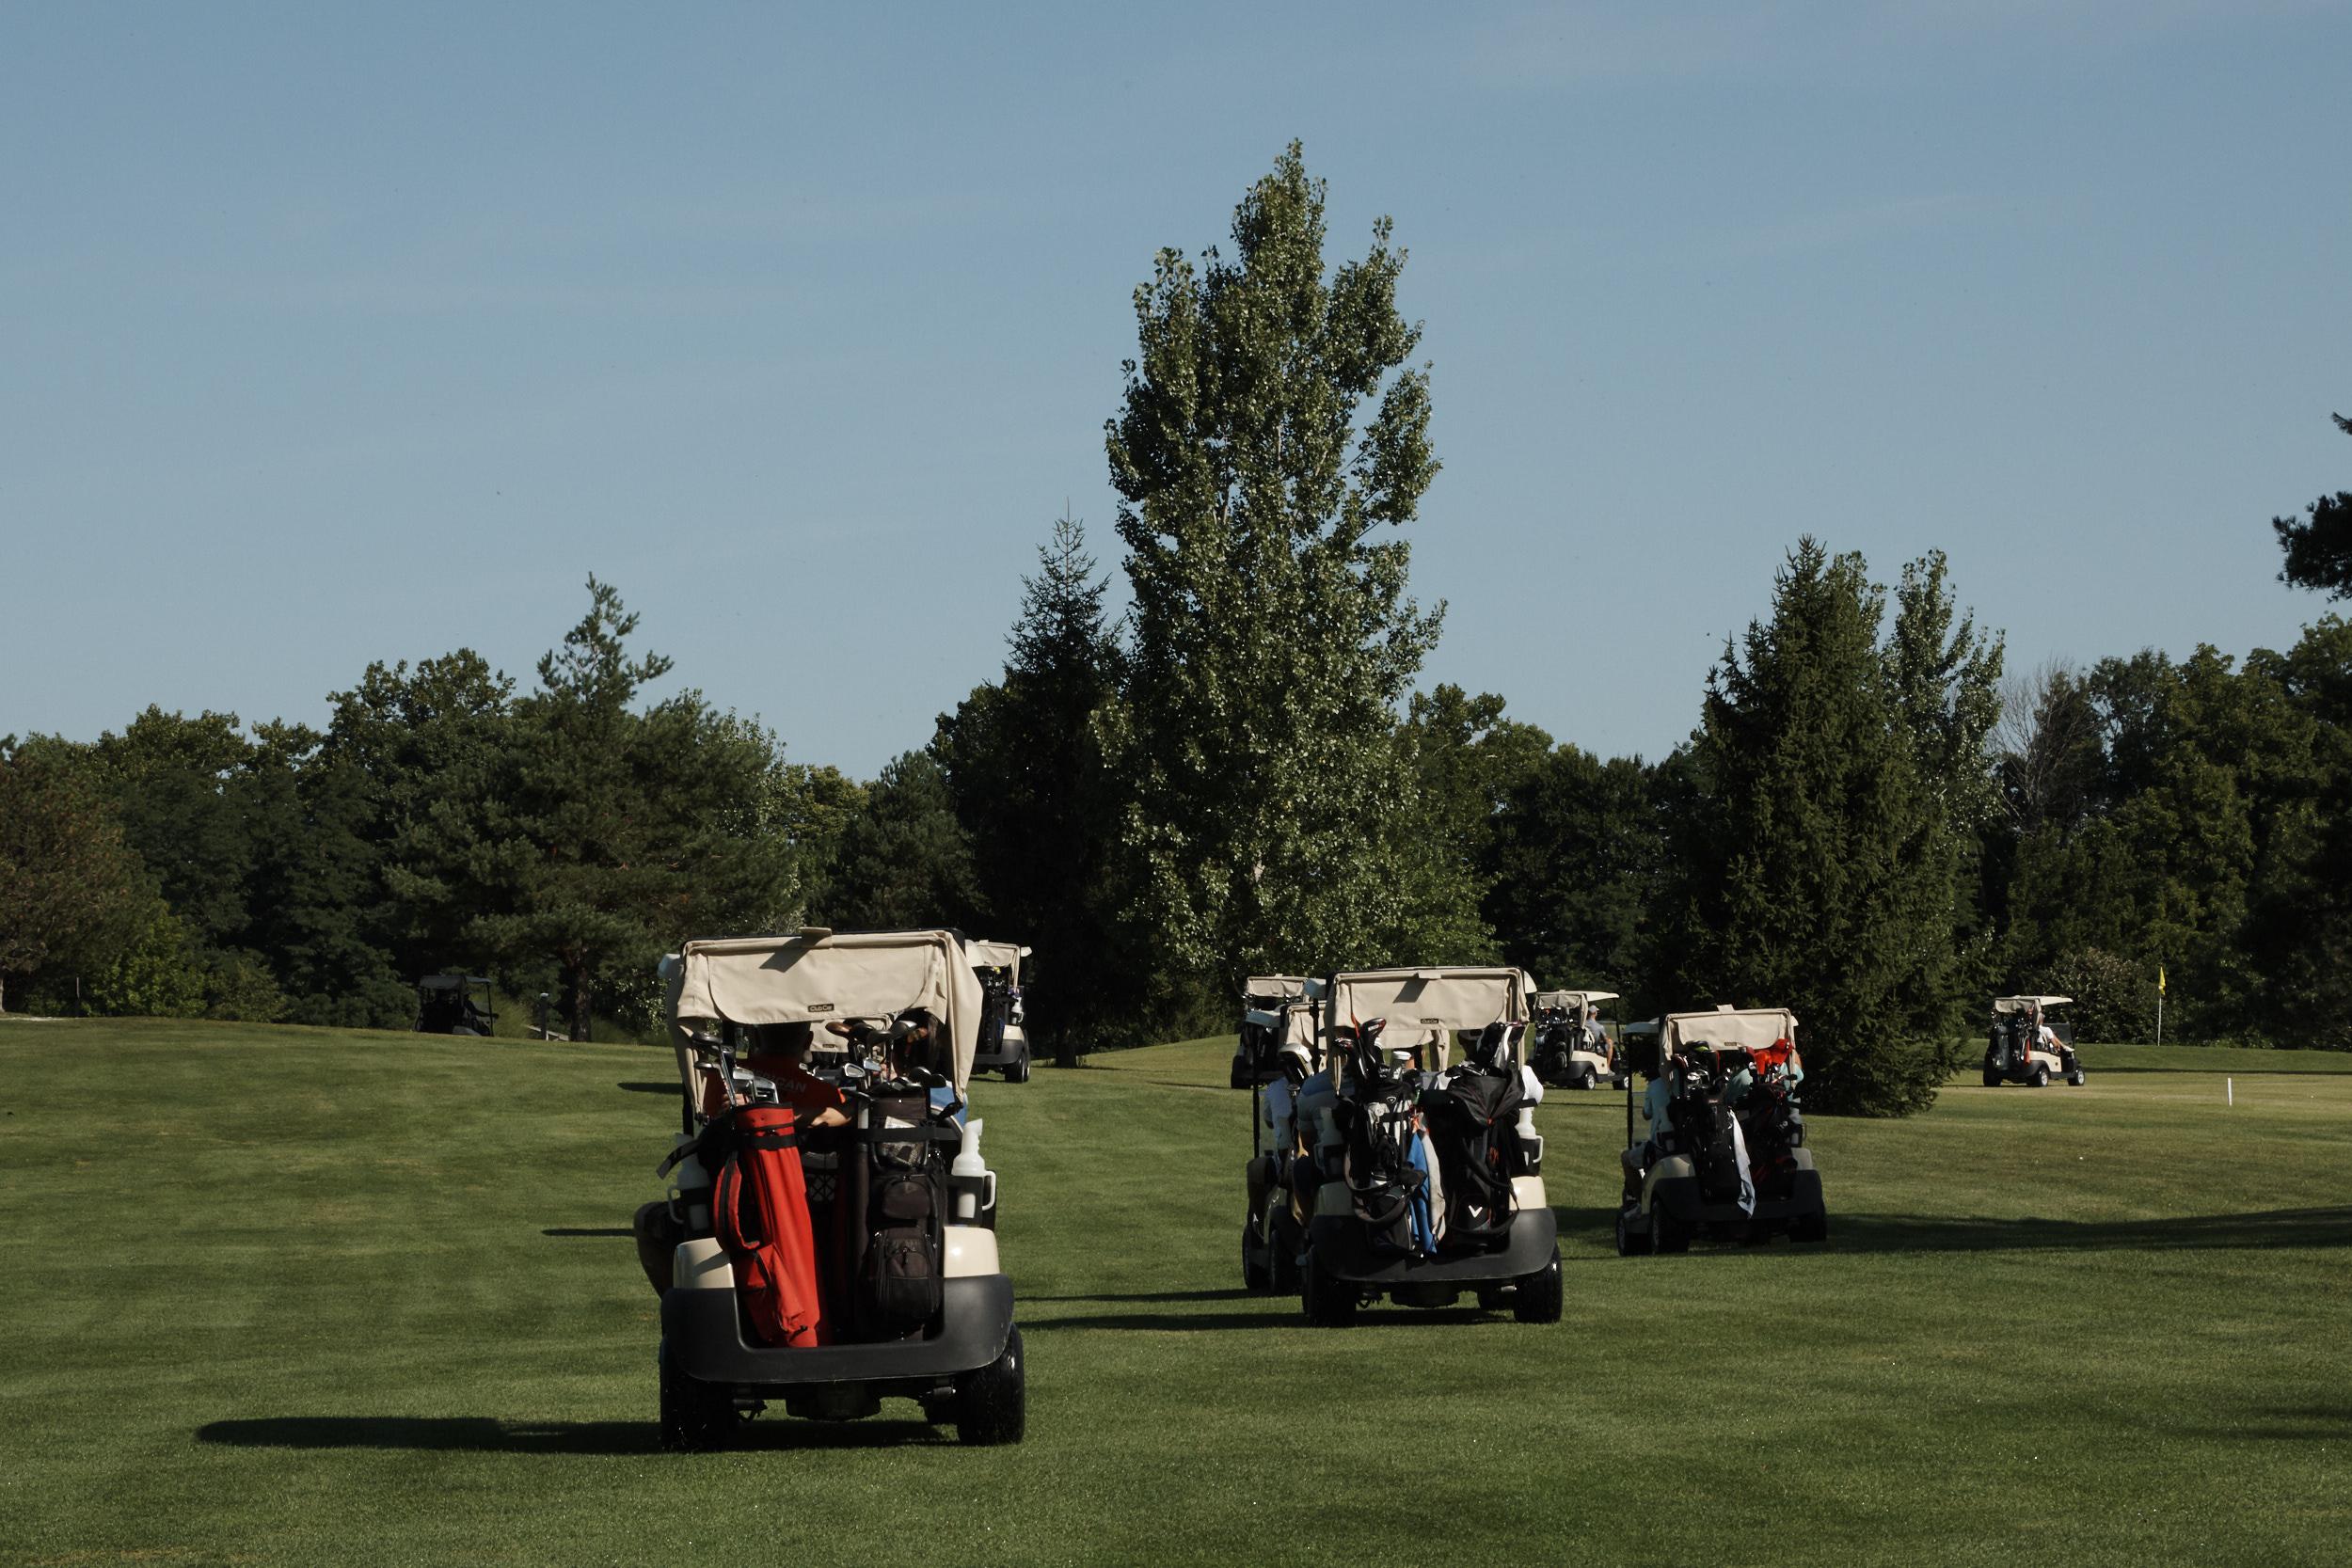 20180728 MTM Golf Outing - Tim Schumm Photography 008.jpg